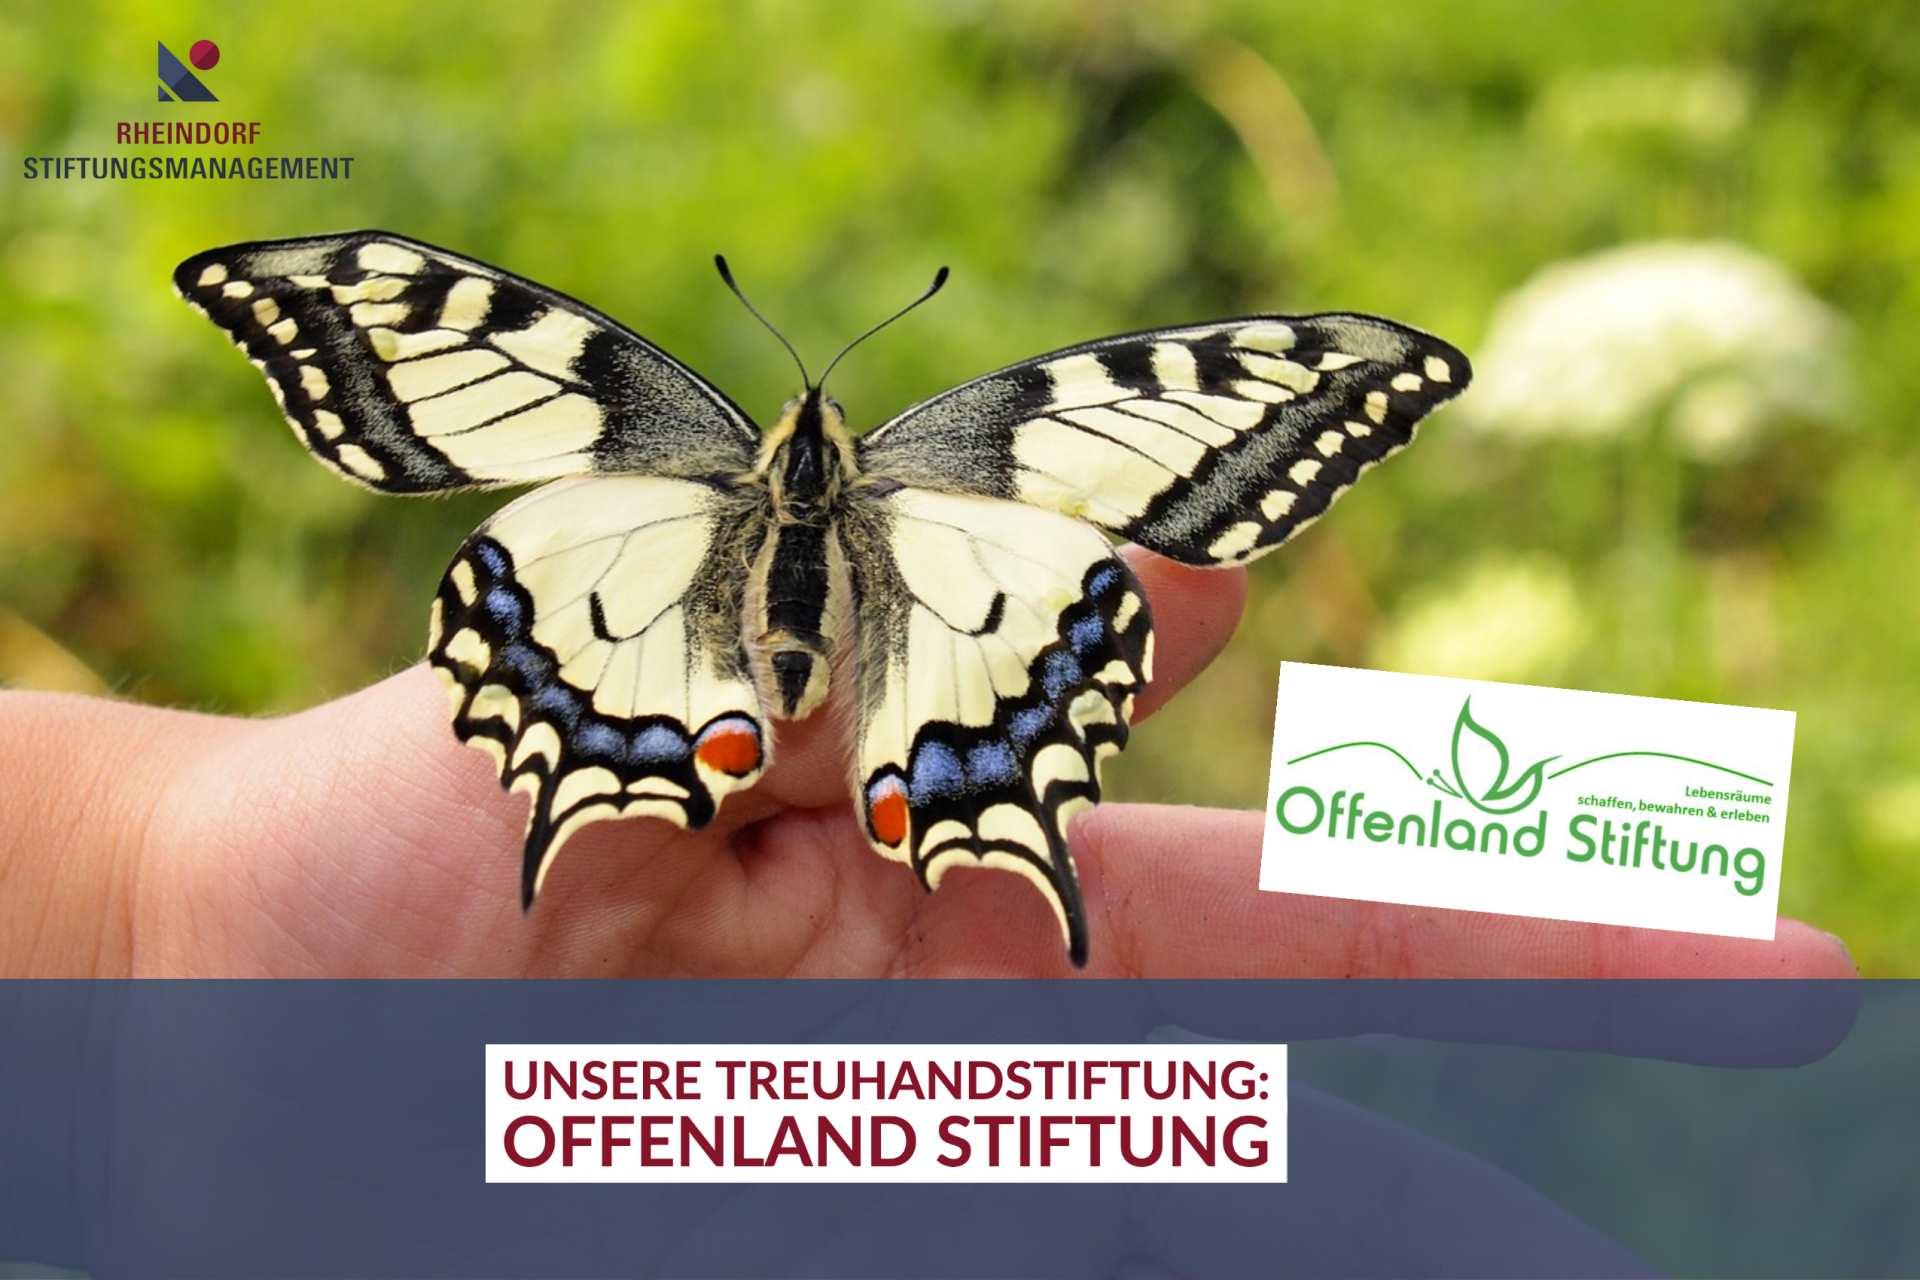 Offenland Stiftung: Corona fördert den Sinn für Natur- und Artenschutz